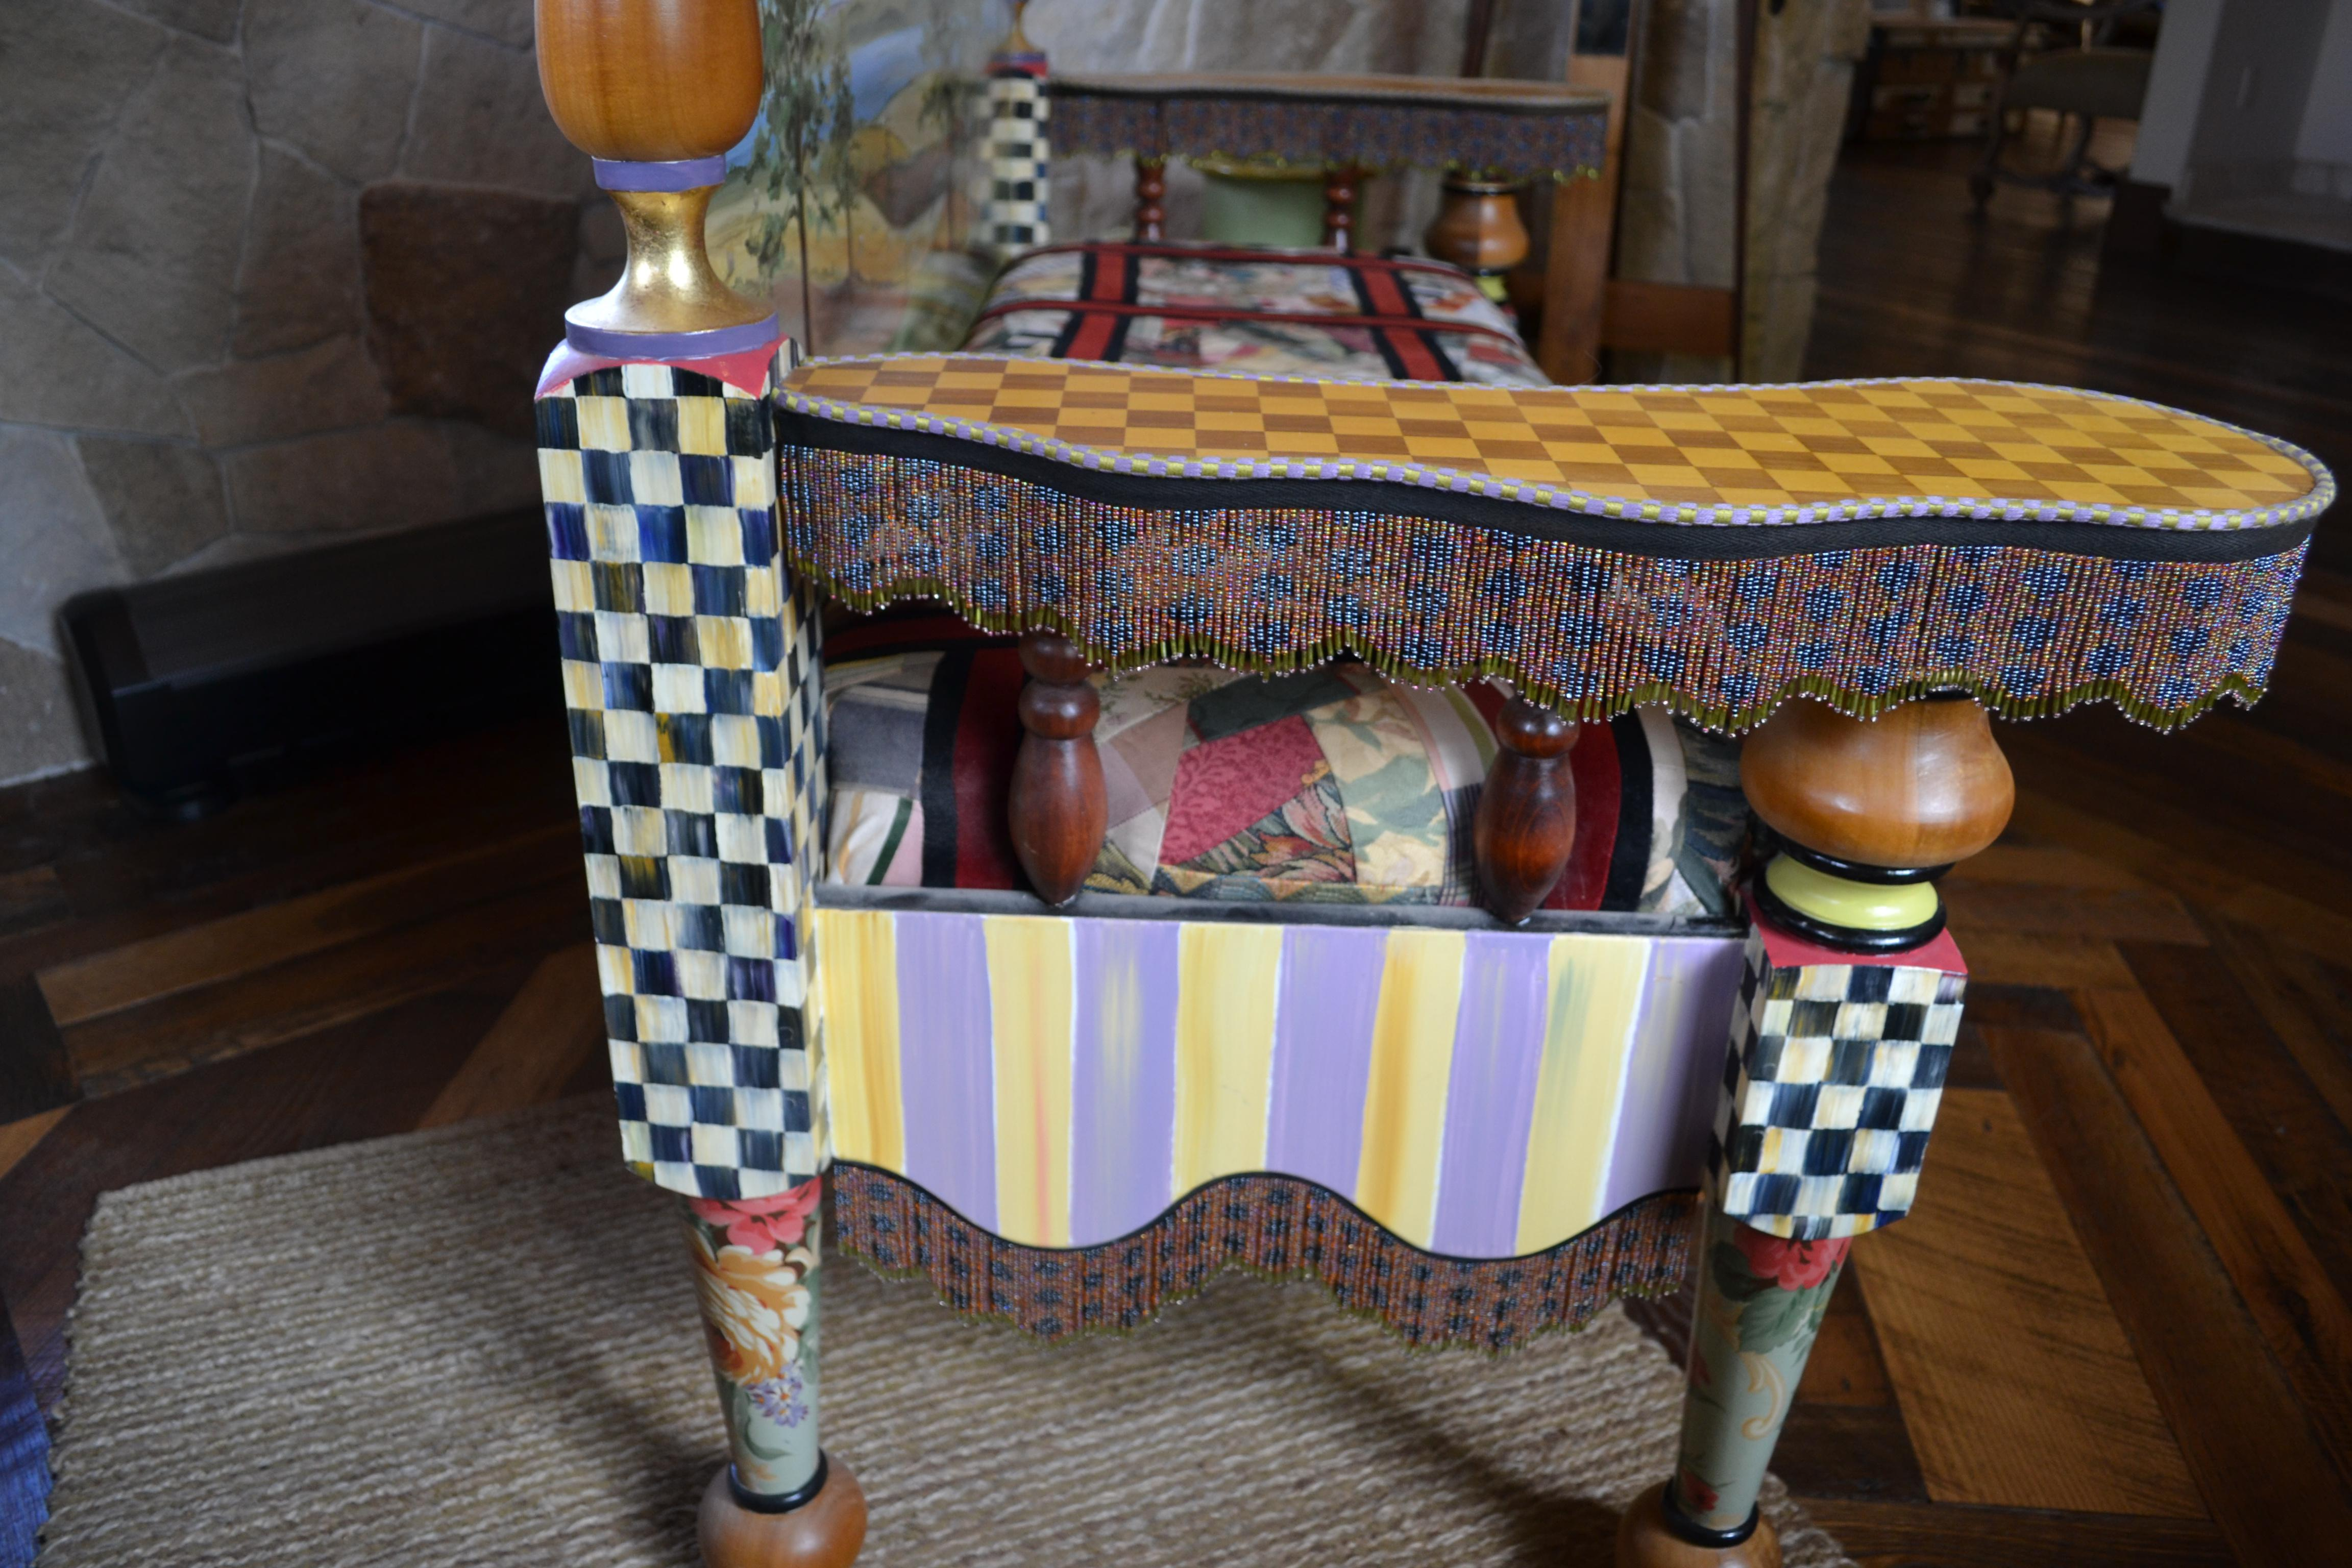 Mackenzie Childs Furniture Collection Sitting Bench Chairish